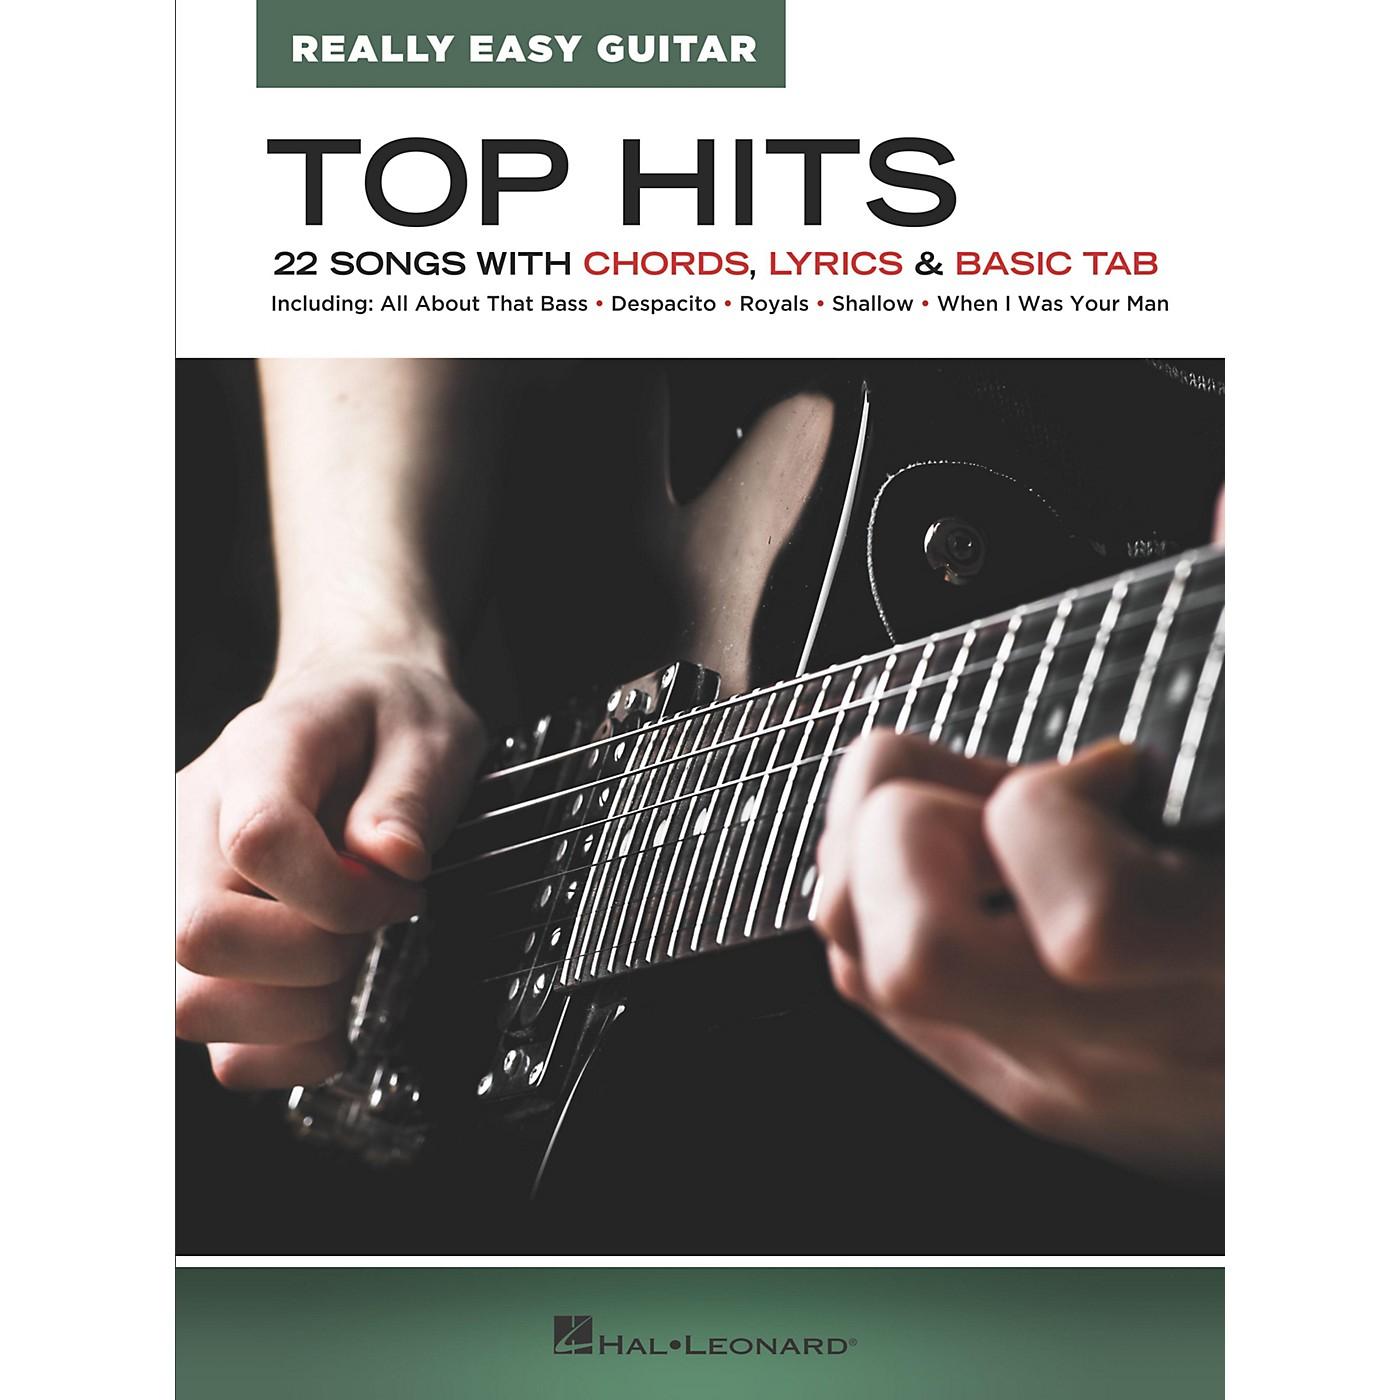 Hal Leonard Top Hits - Really Easy Guitar Songbook thumbnail